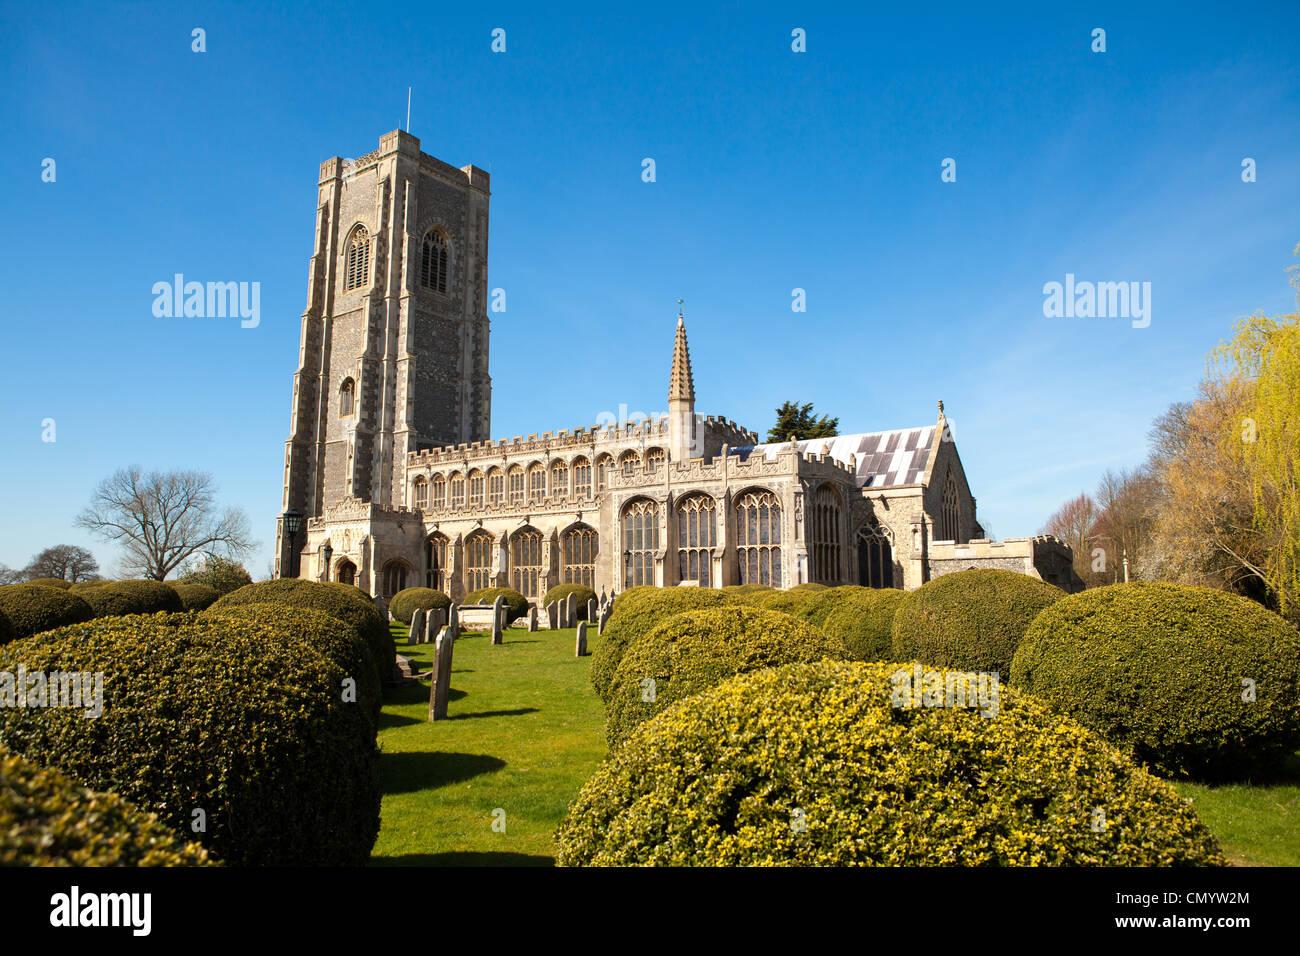 St Peter and St Paul's Church, Lavenham, Suffolk, UK - Stock Image